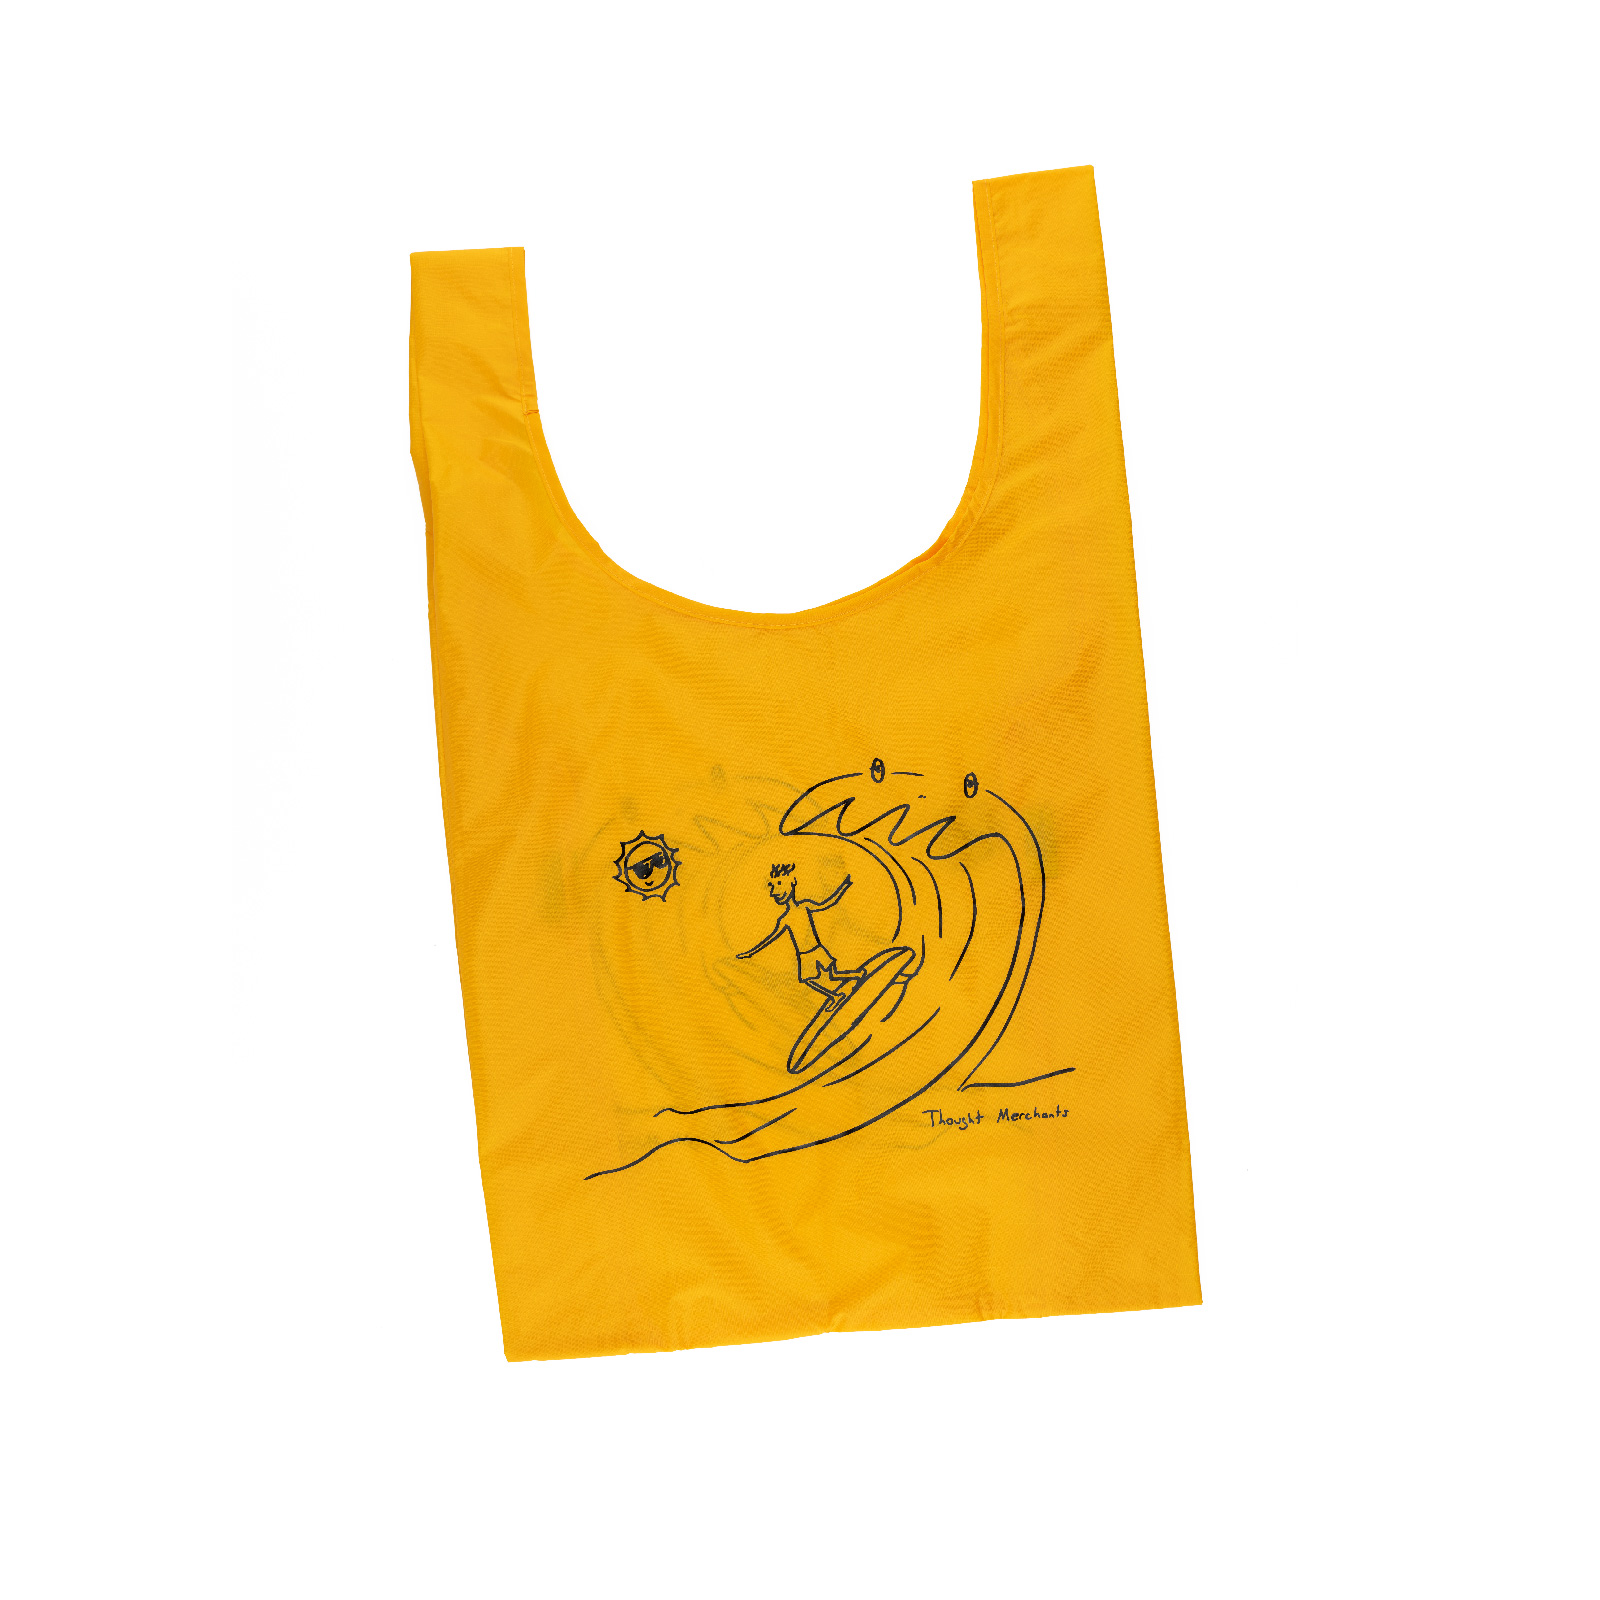 A reusable shopping bag for all your shopping bag needs.